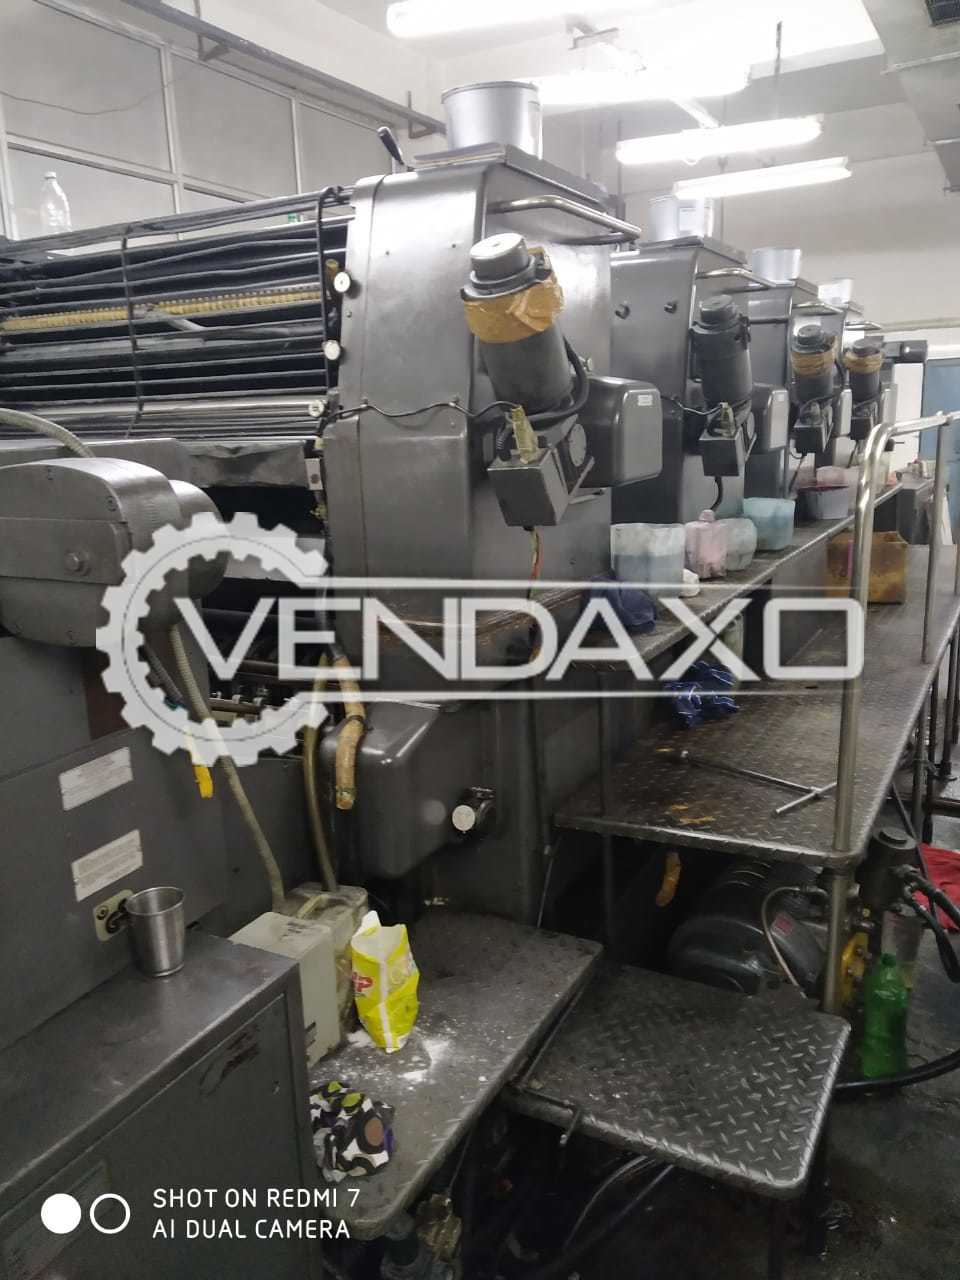 Heidelberg HD 102V Offset Printing Machine - 28 x 40 Inch, 4 Color